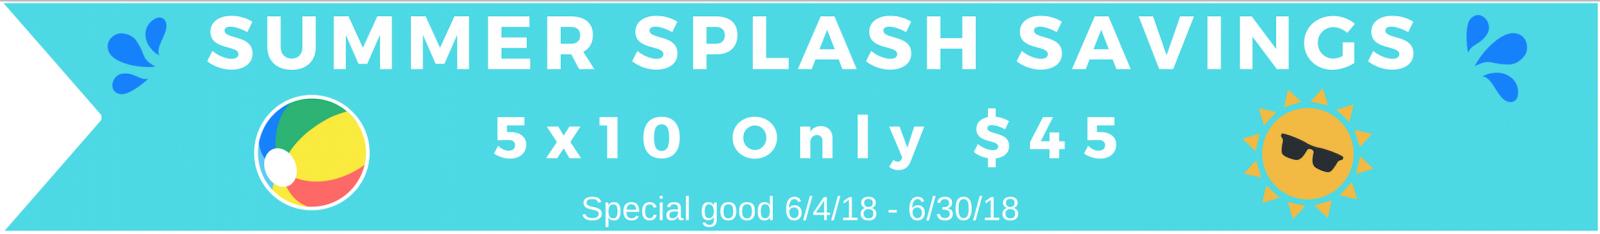 Summer Splash Savings! 5x10 Only $45